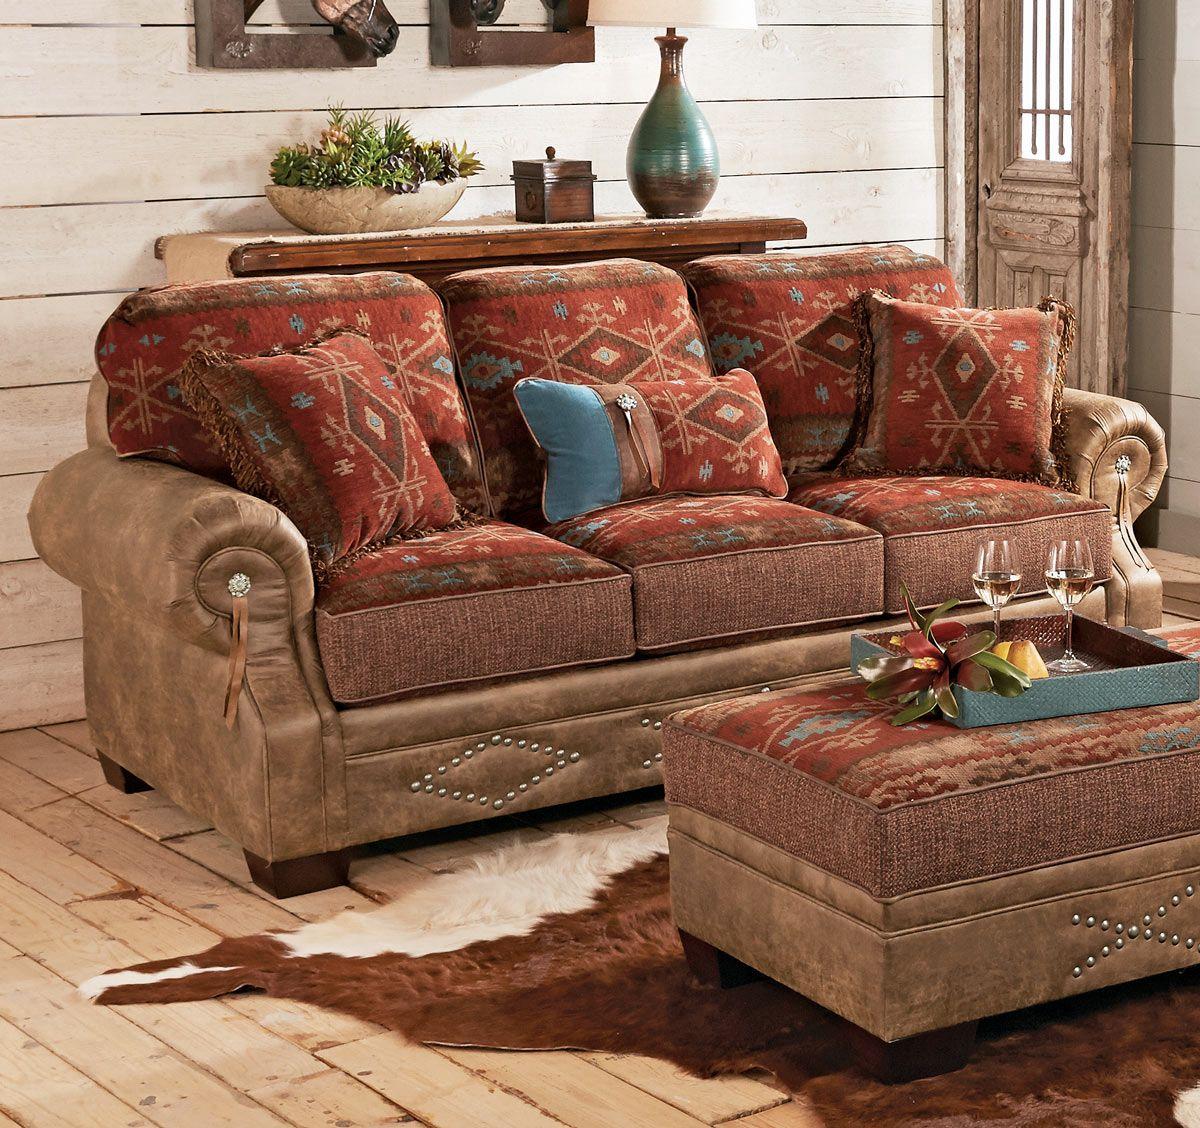 Ranchero Southwestern Sofa   Living Room   Pinterest ...